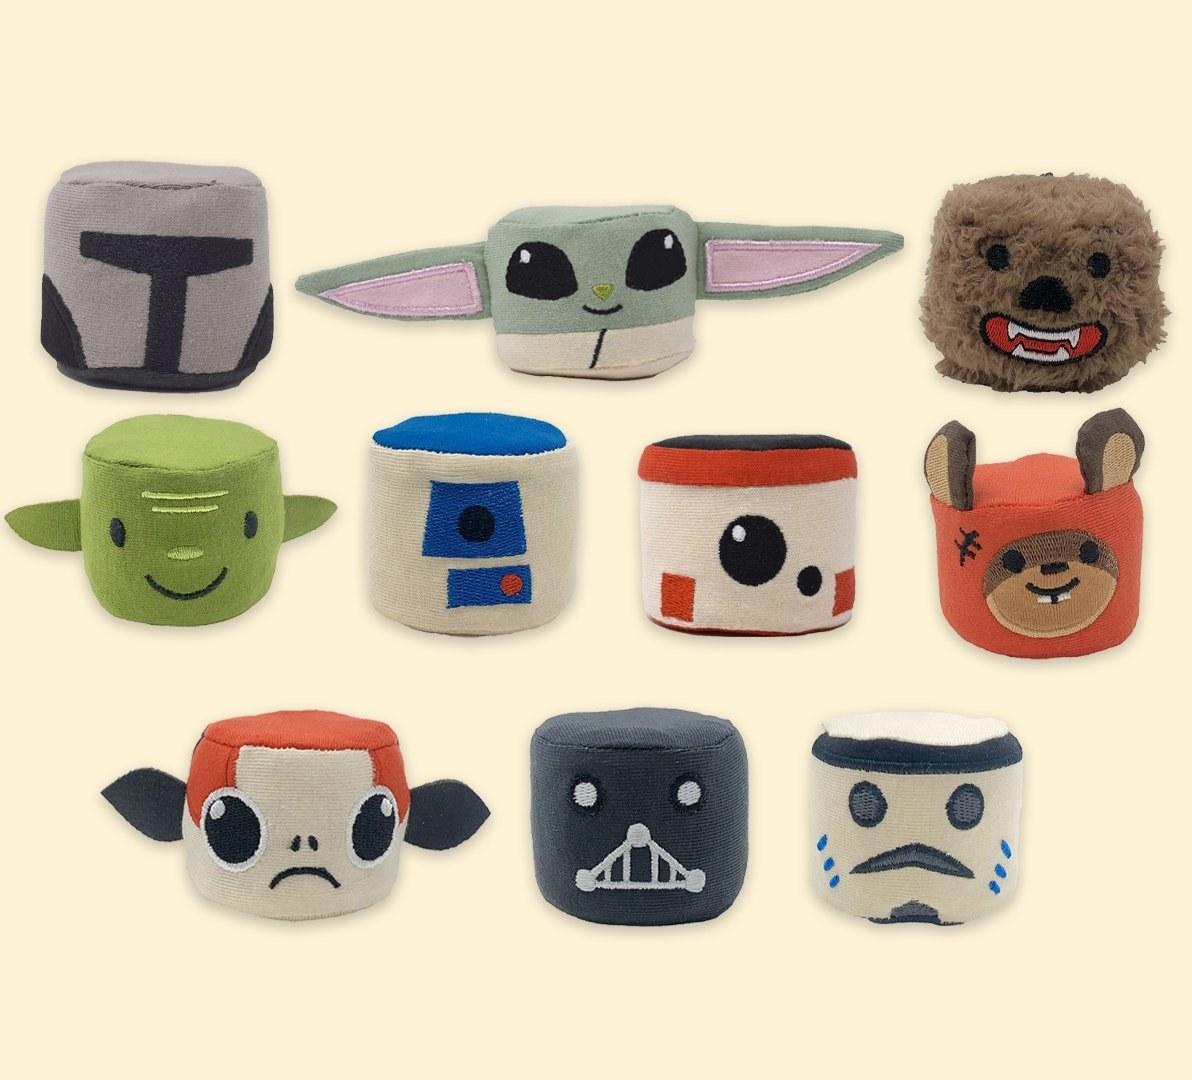 Star Wars squishees